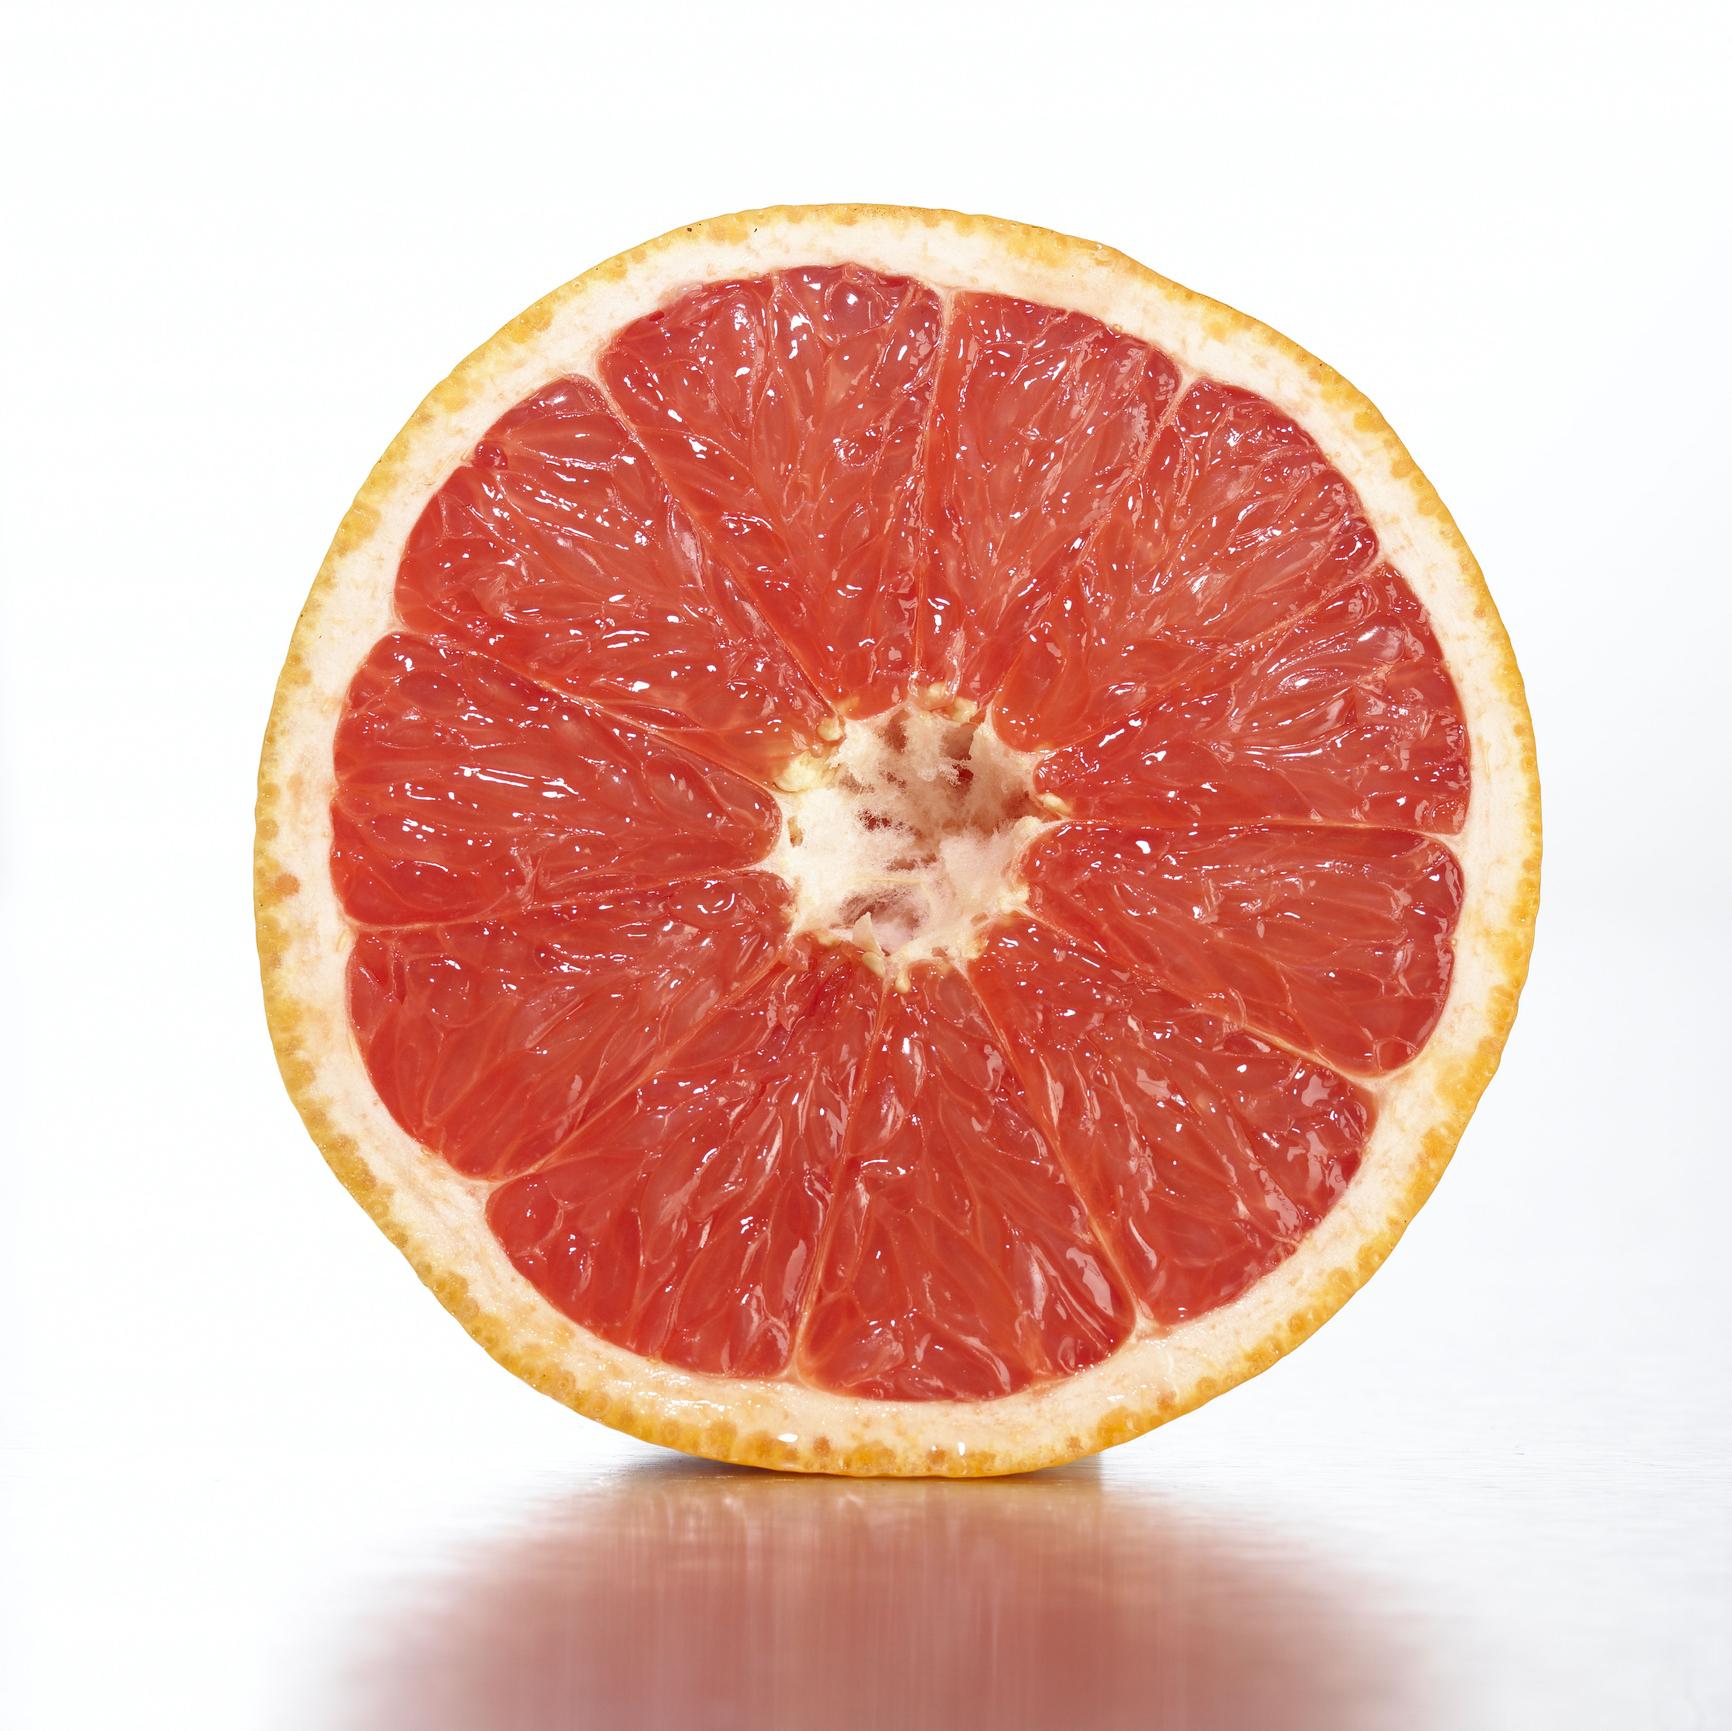 Grapefruit half image